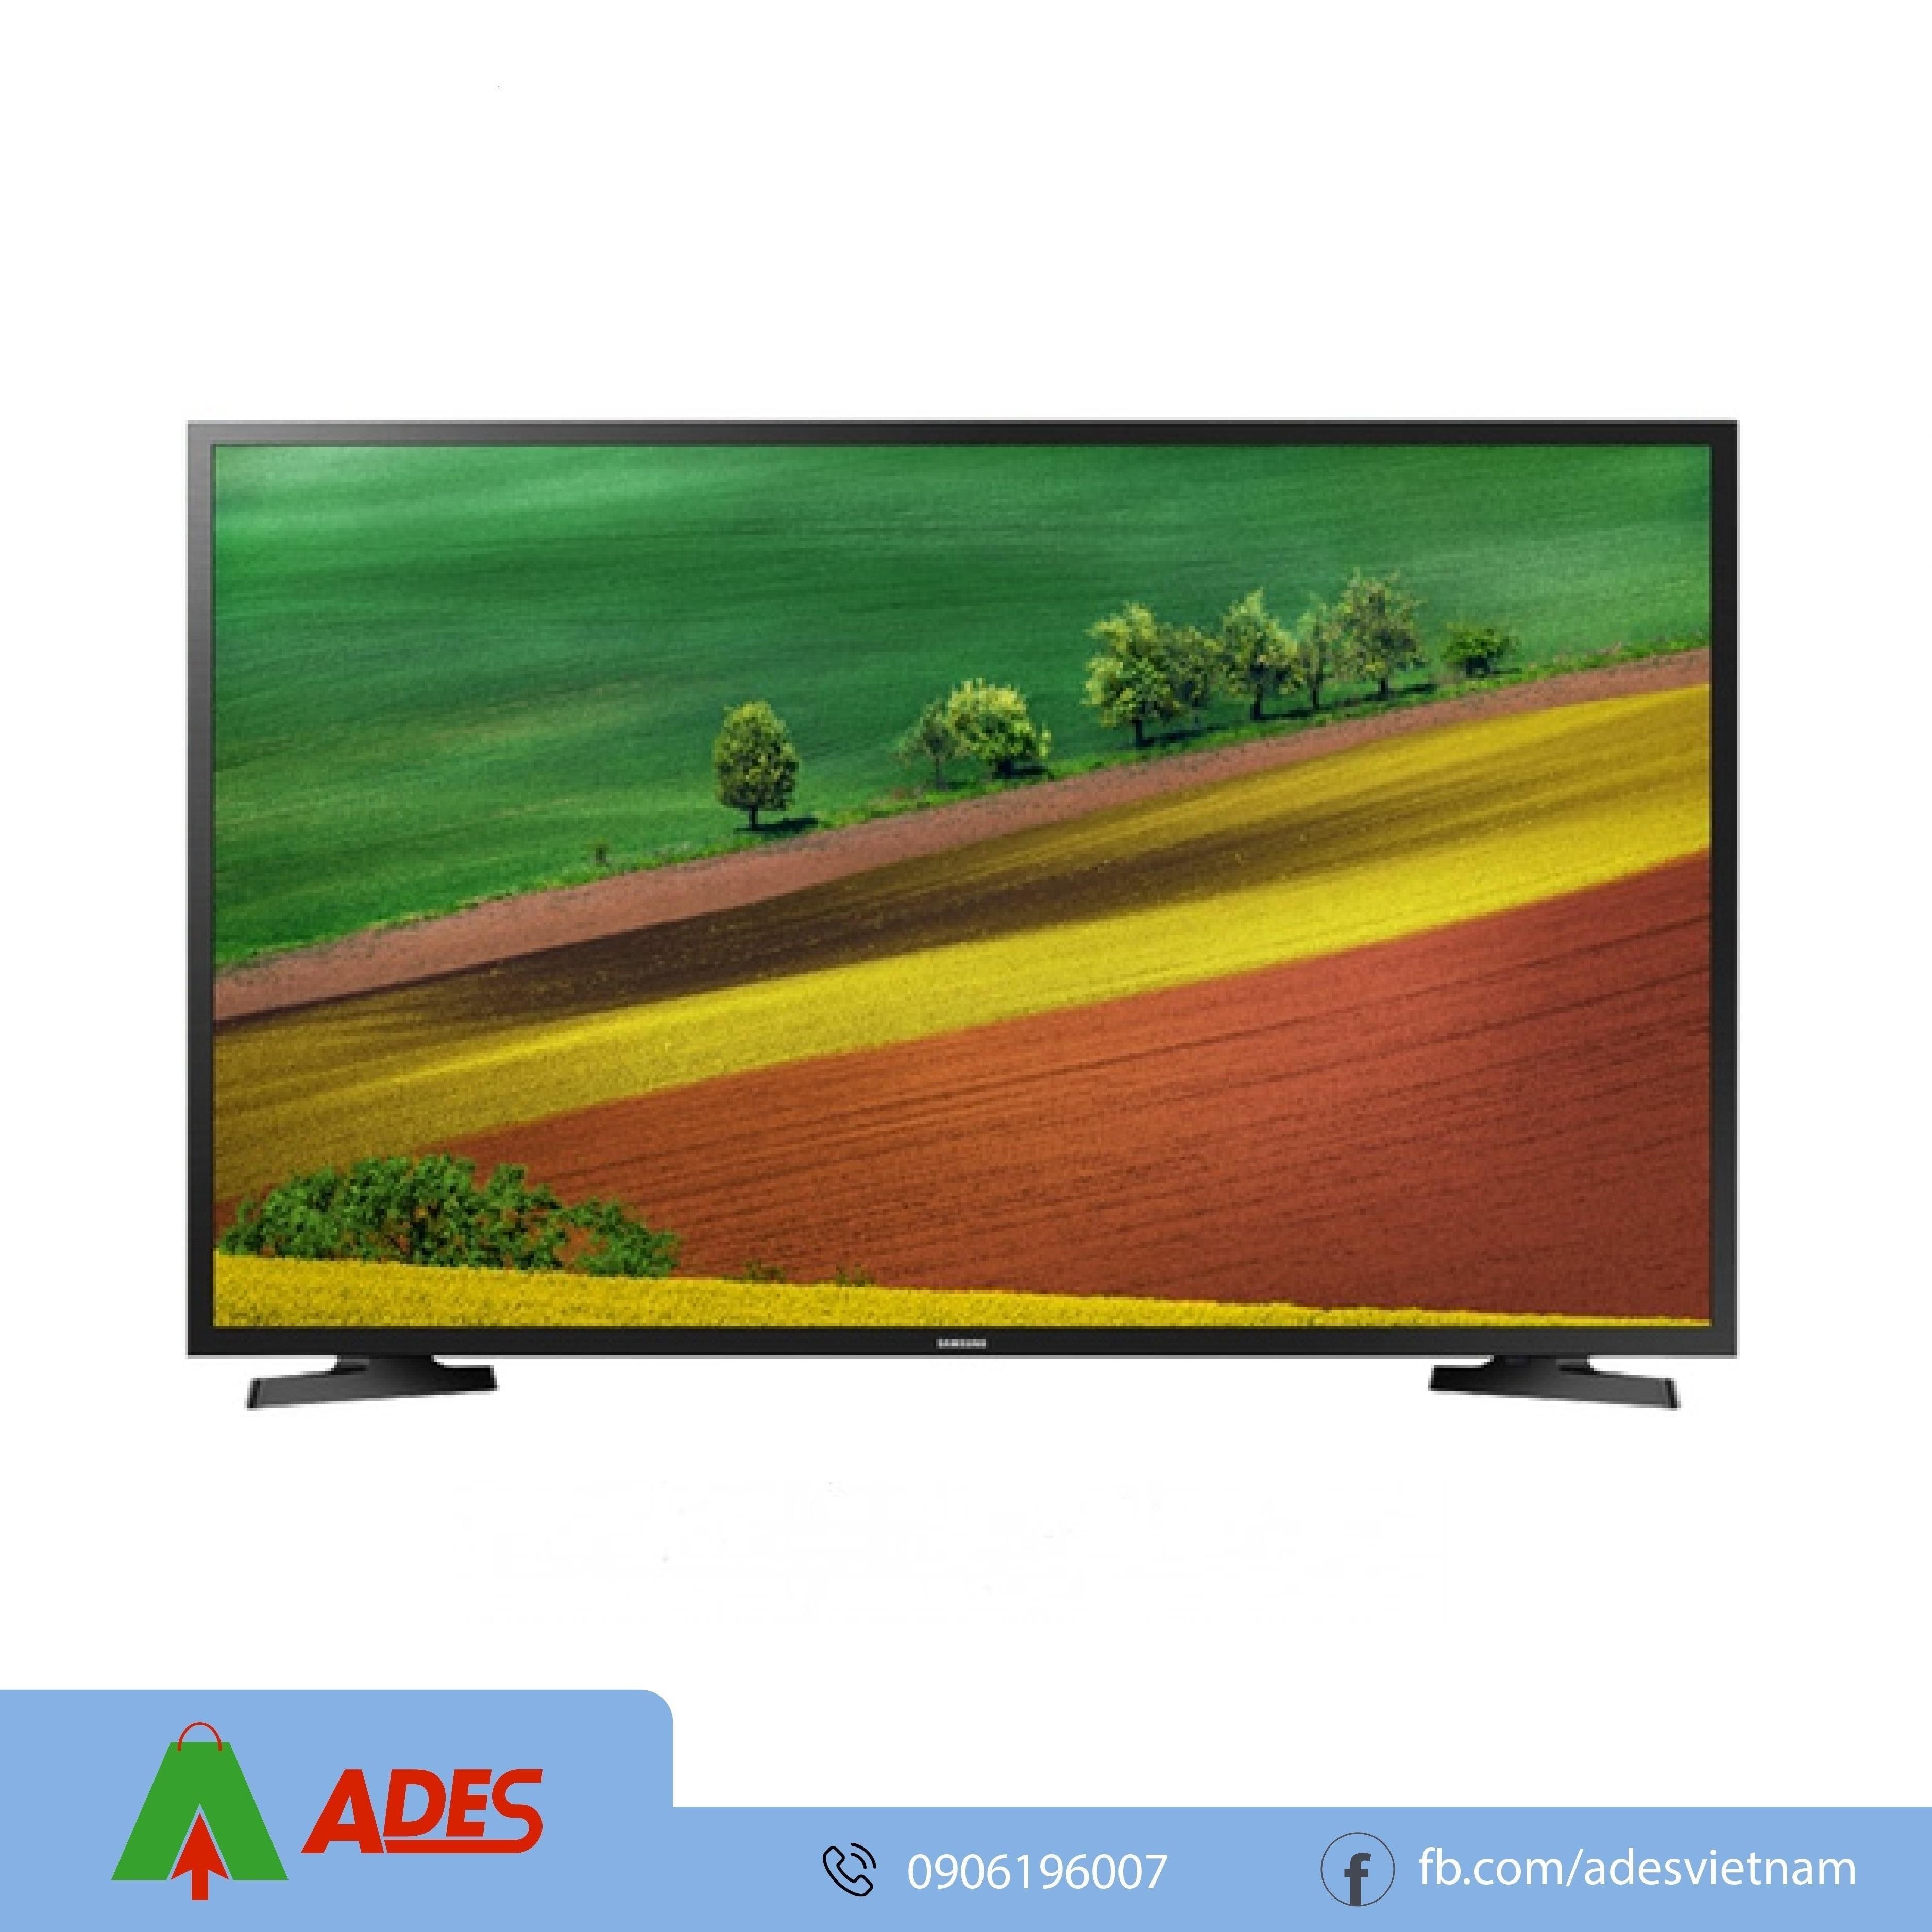 Bảng giá Smart Tivi QLED Samsung 40 inch 40J5250